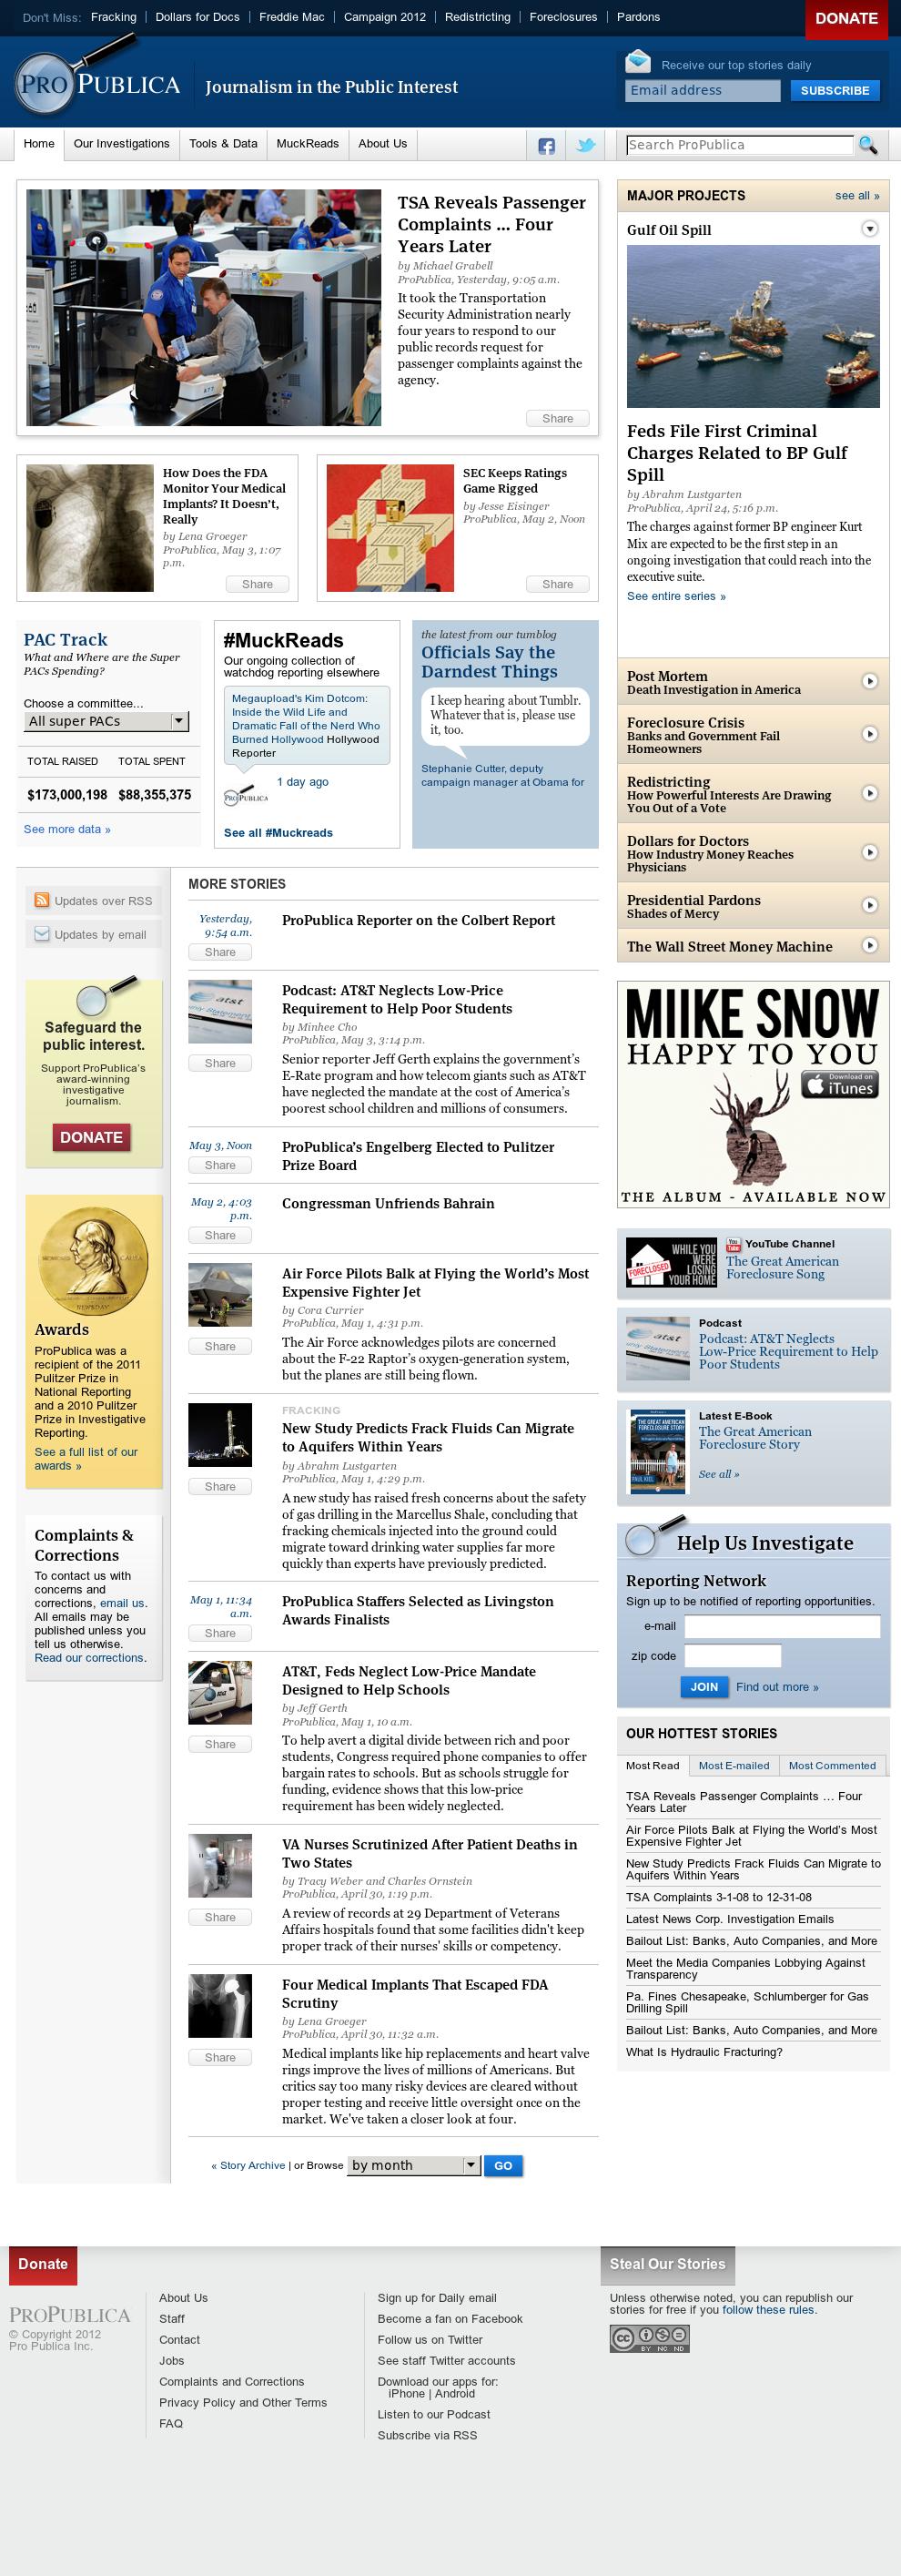 ProPublica at Saturday May 5, 2012, 11:09 a.m. UTC